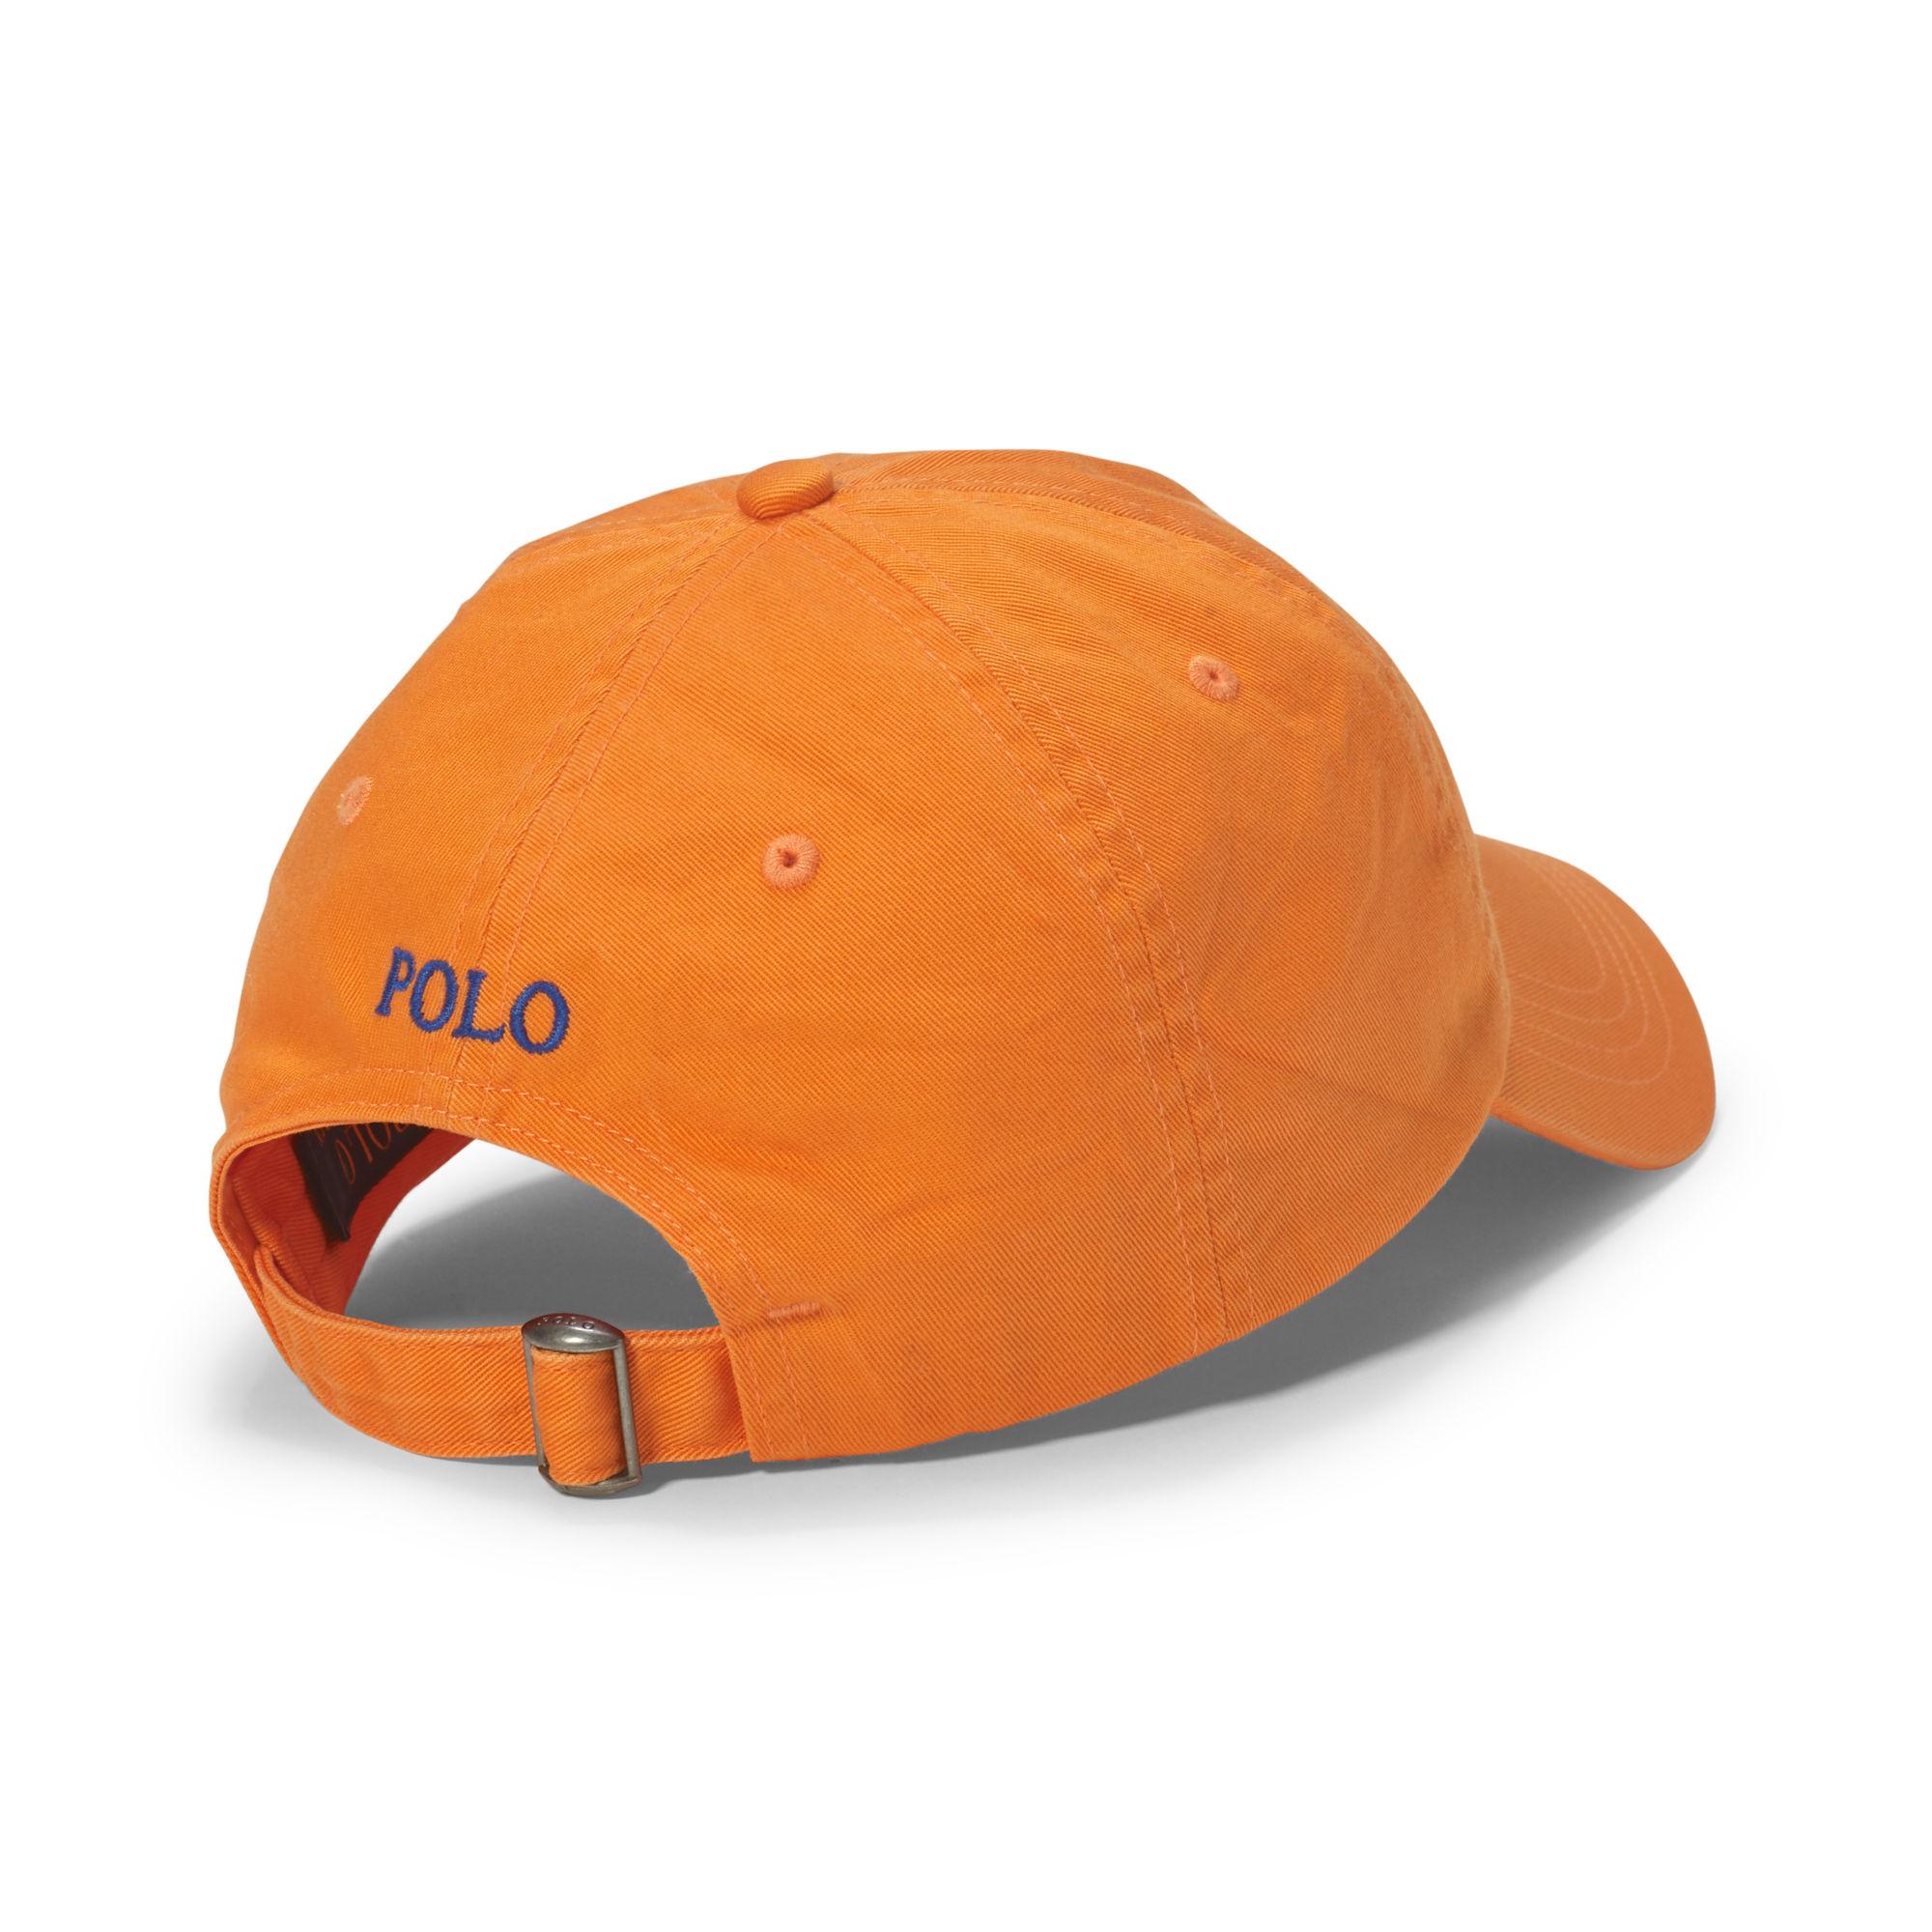 5639d36e2c5 Polo Ralph Lauren Cotton Chino Baseball Cap in Orange for Men - Lyst